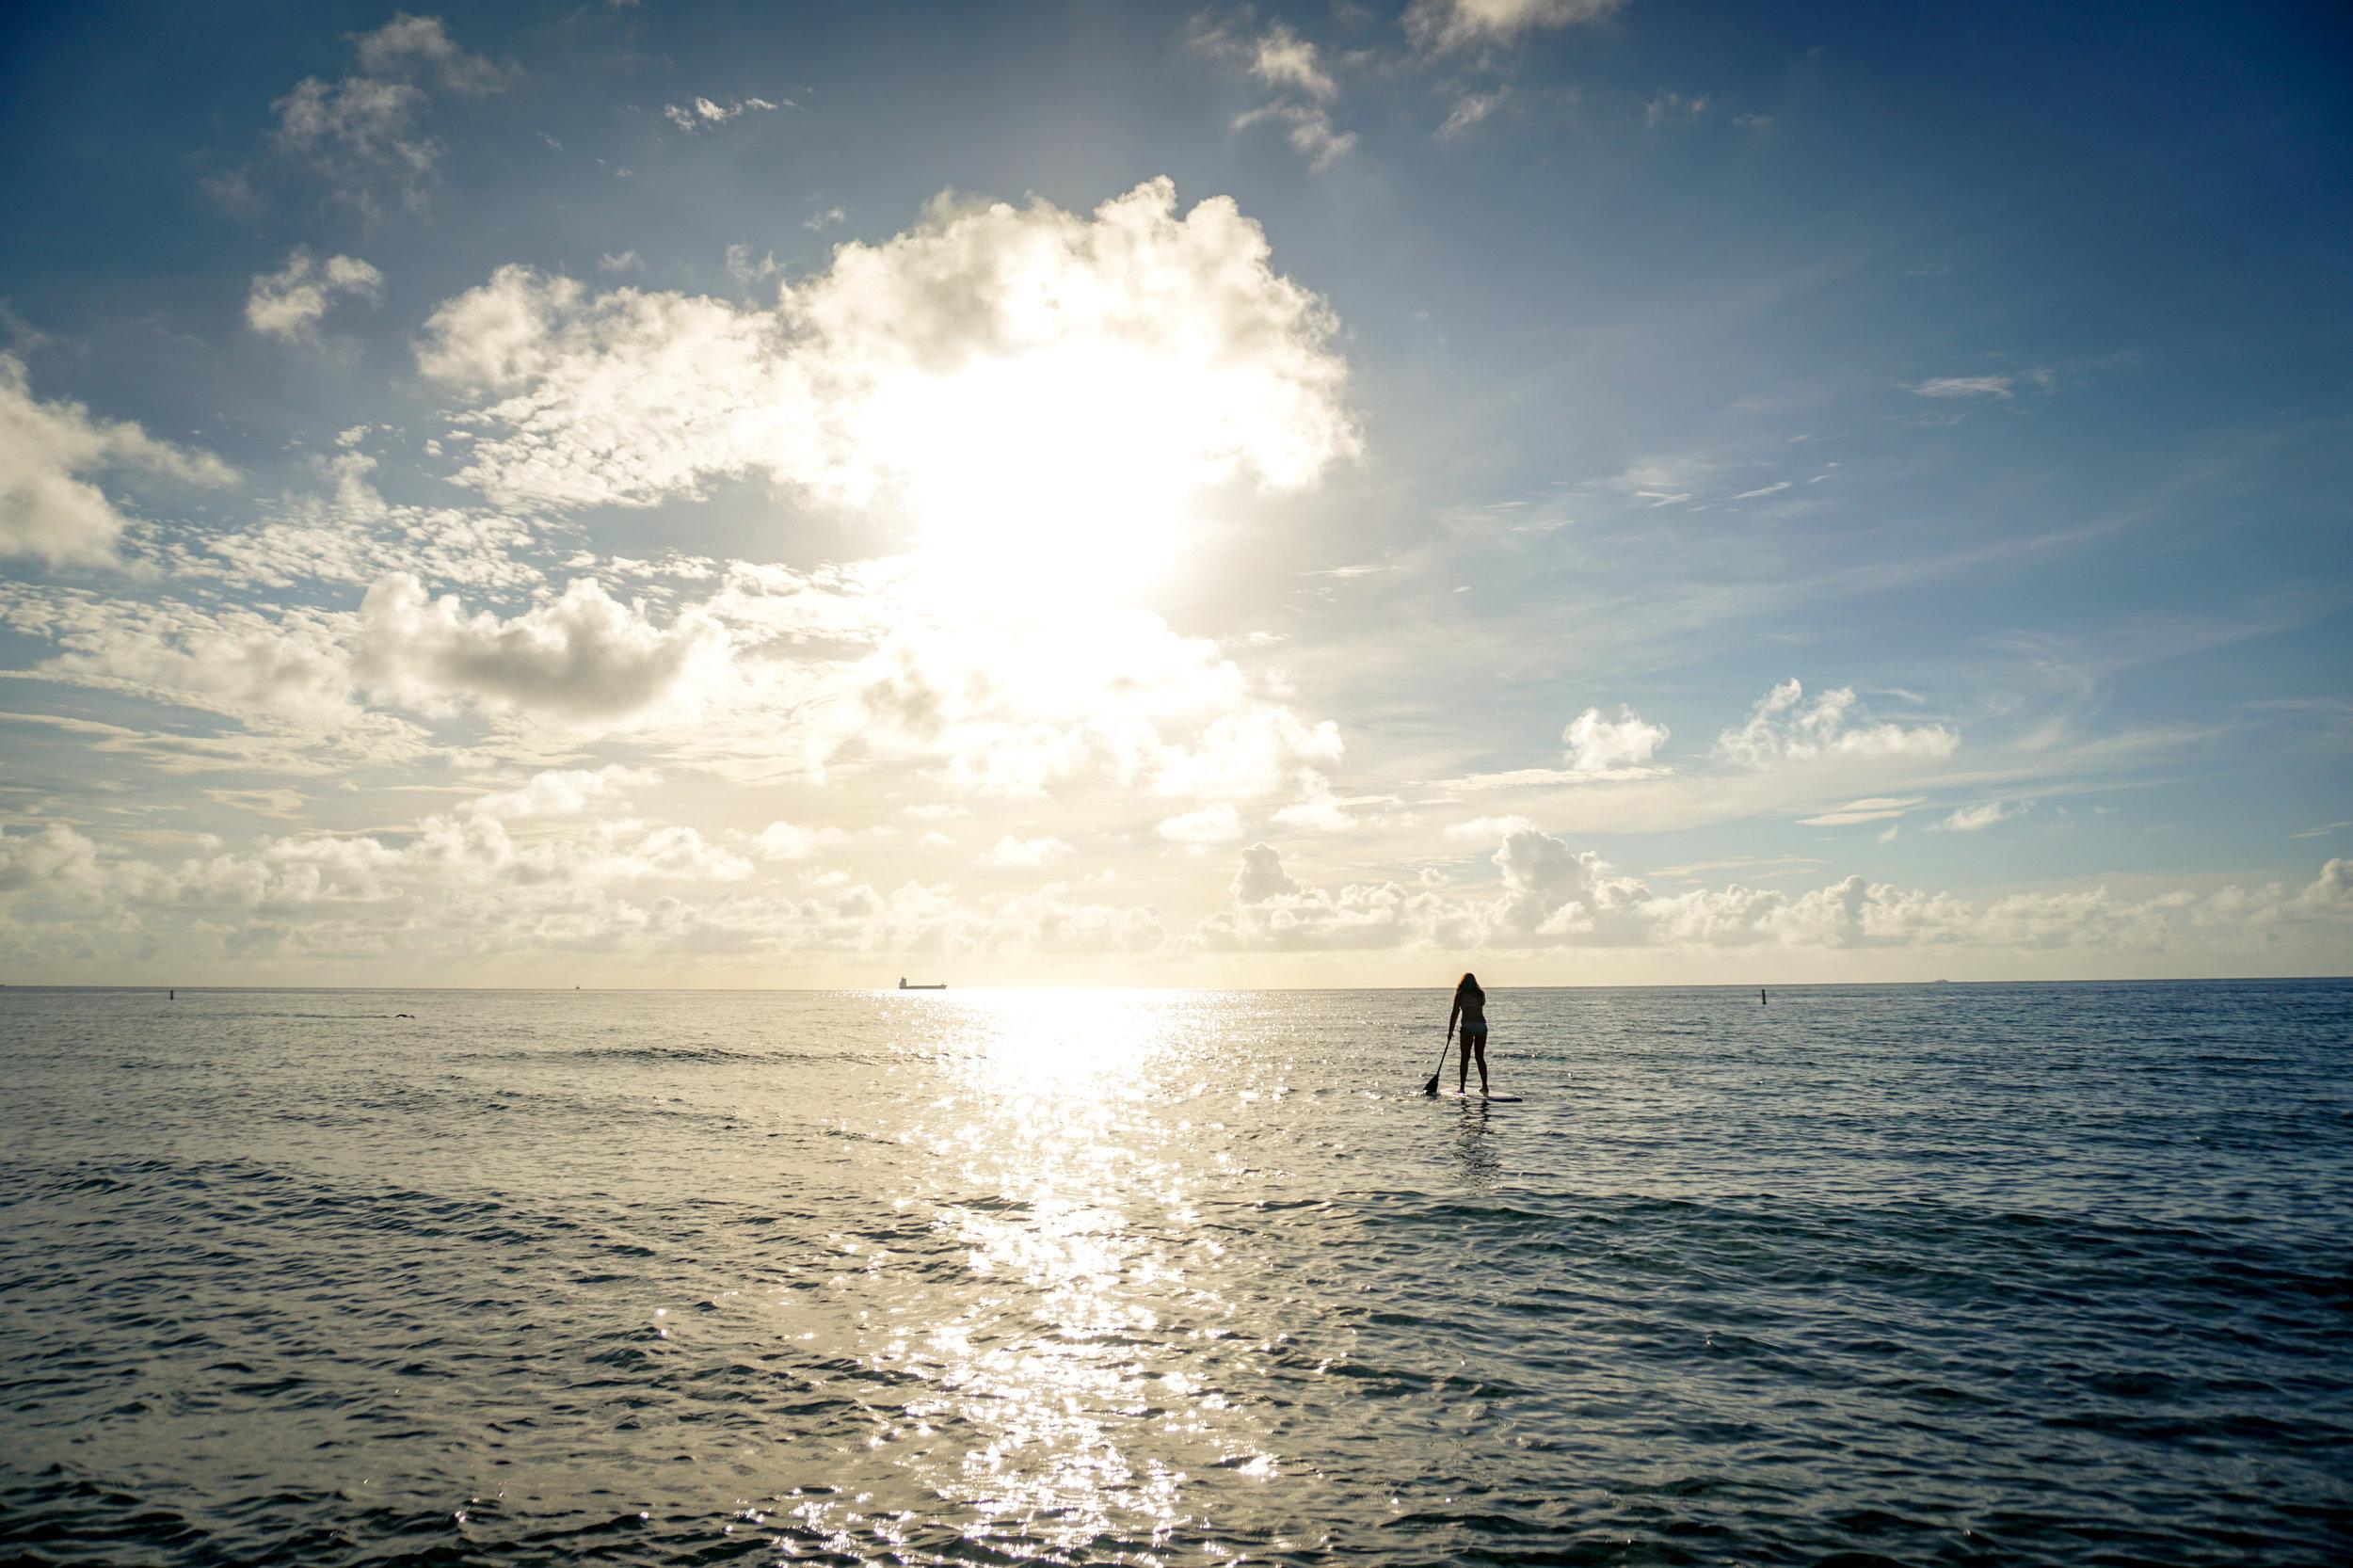 ola-pi-creative-finding-mindfulness-water-sup